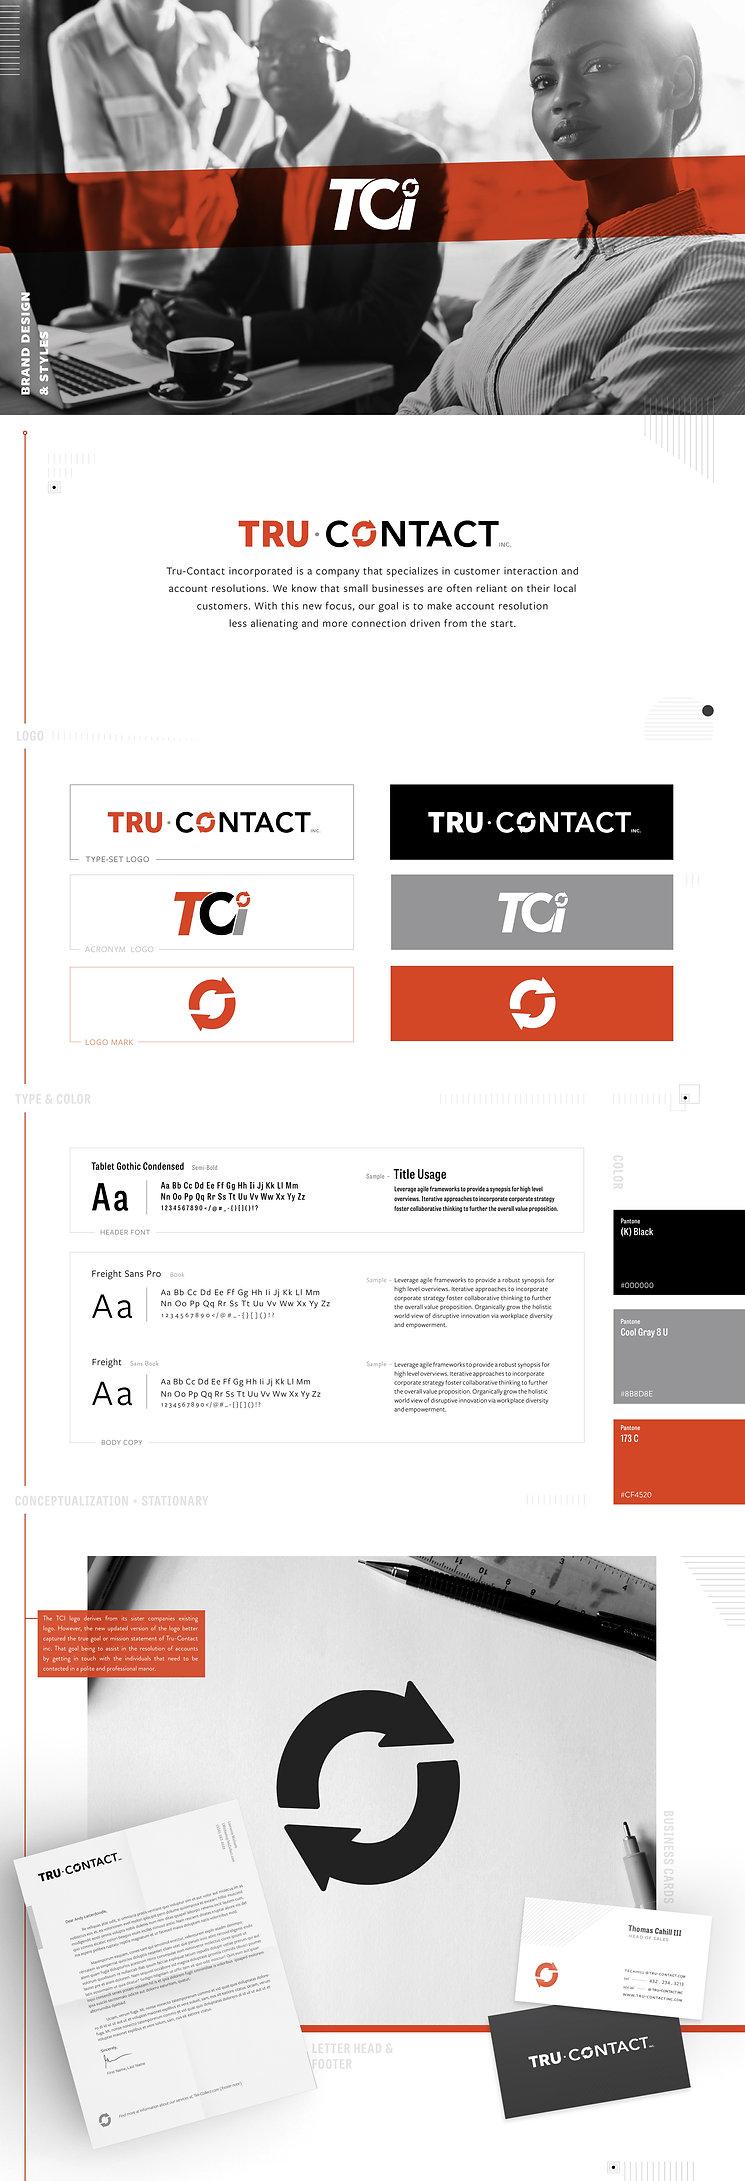 TCI-Branding_Guidlines-presentation-V3-.